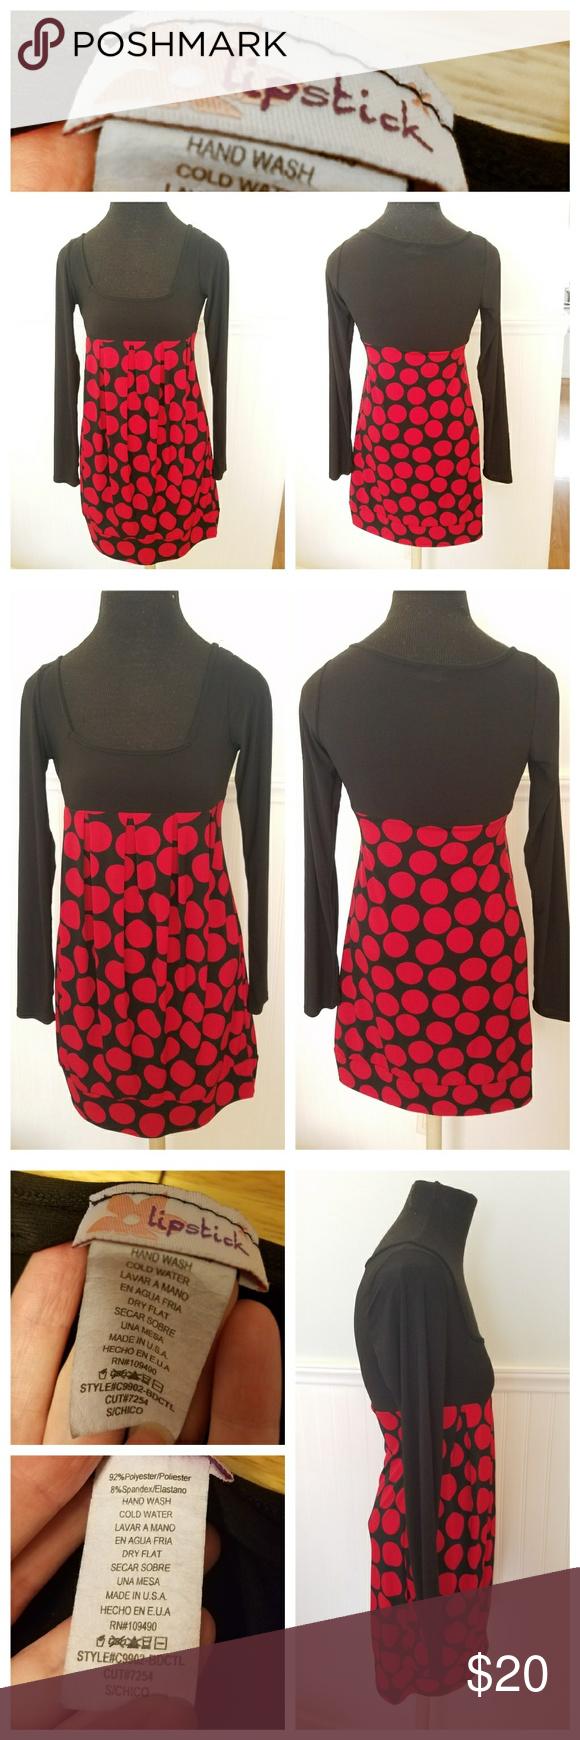 Lipstick black and red polka dot dress sz s my posh picks